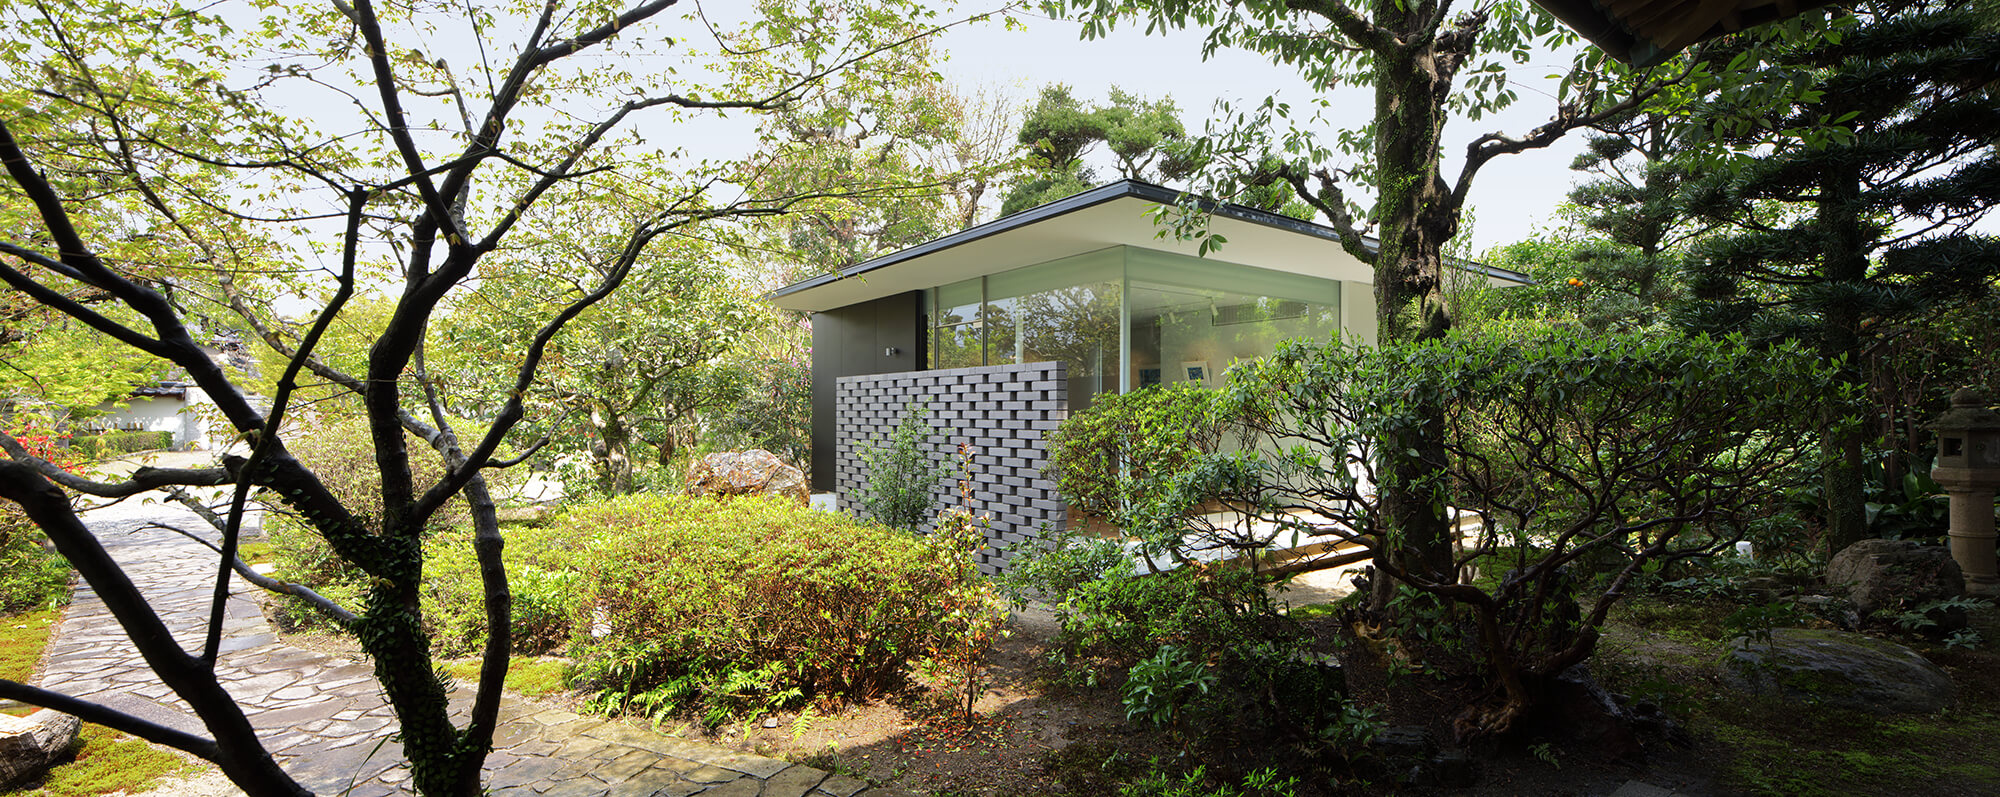 『gallery cobaco』-福岡県朝倉市-建築写真・竣工写真・インテリア写真2